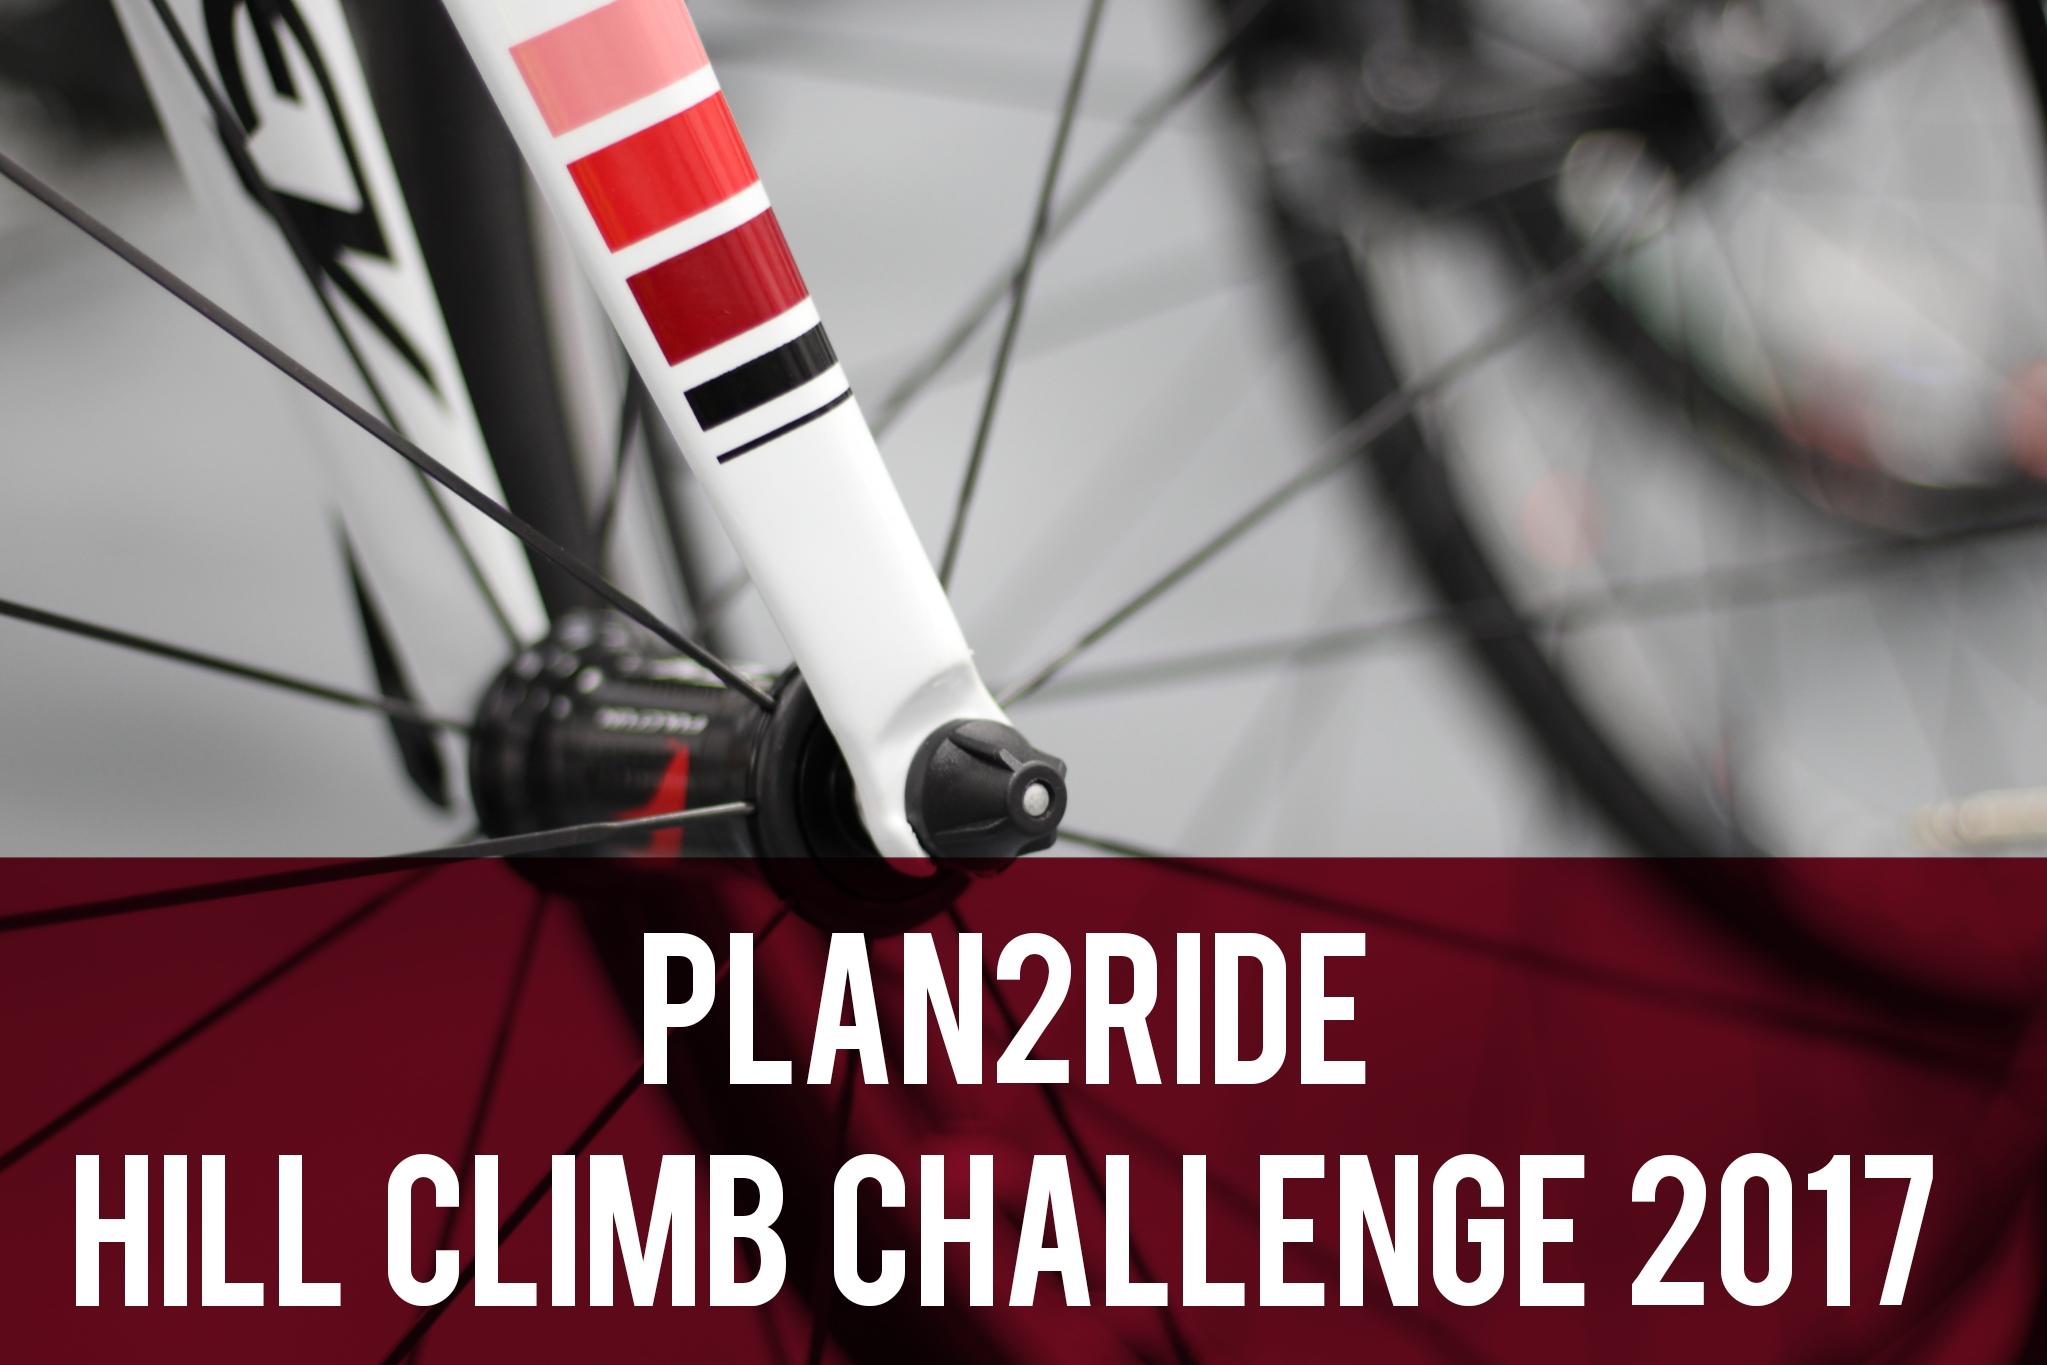 plan2ride hill climb challenge 2017 header